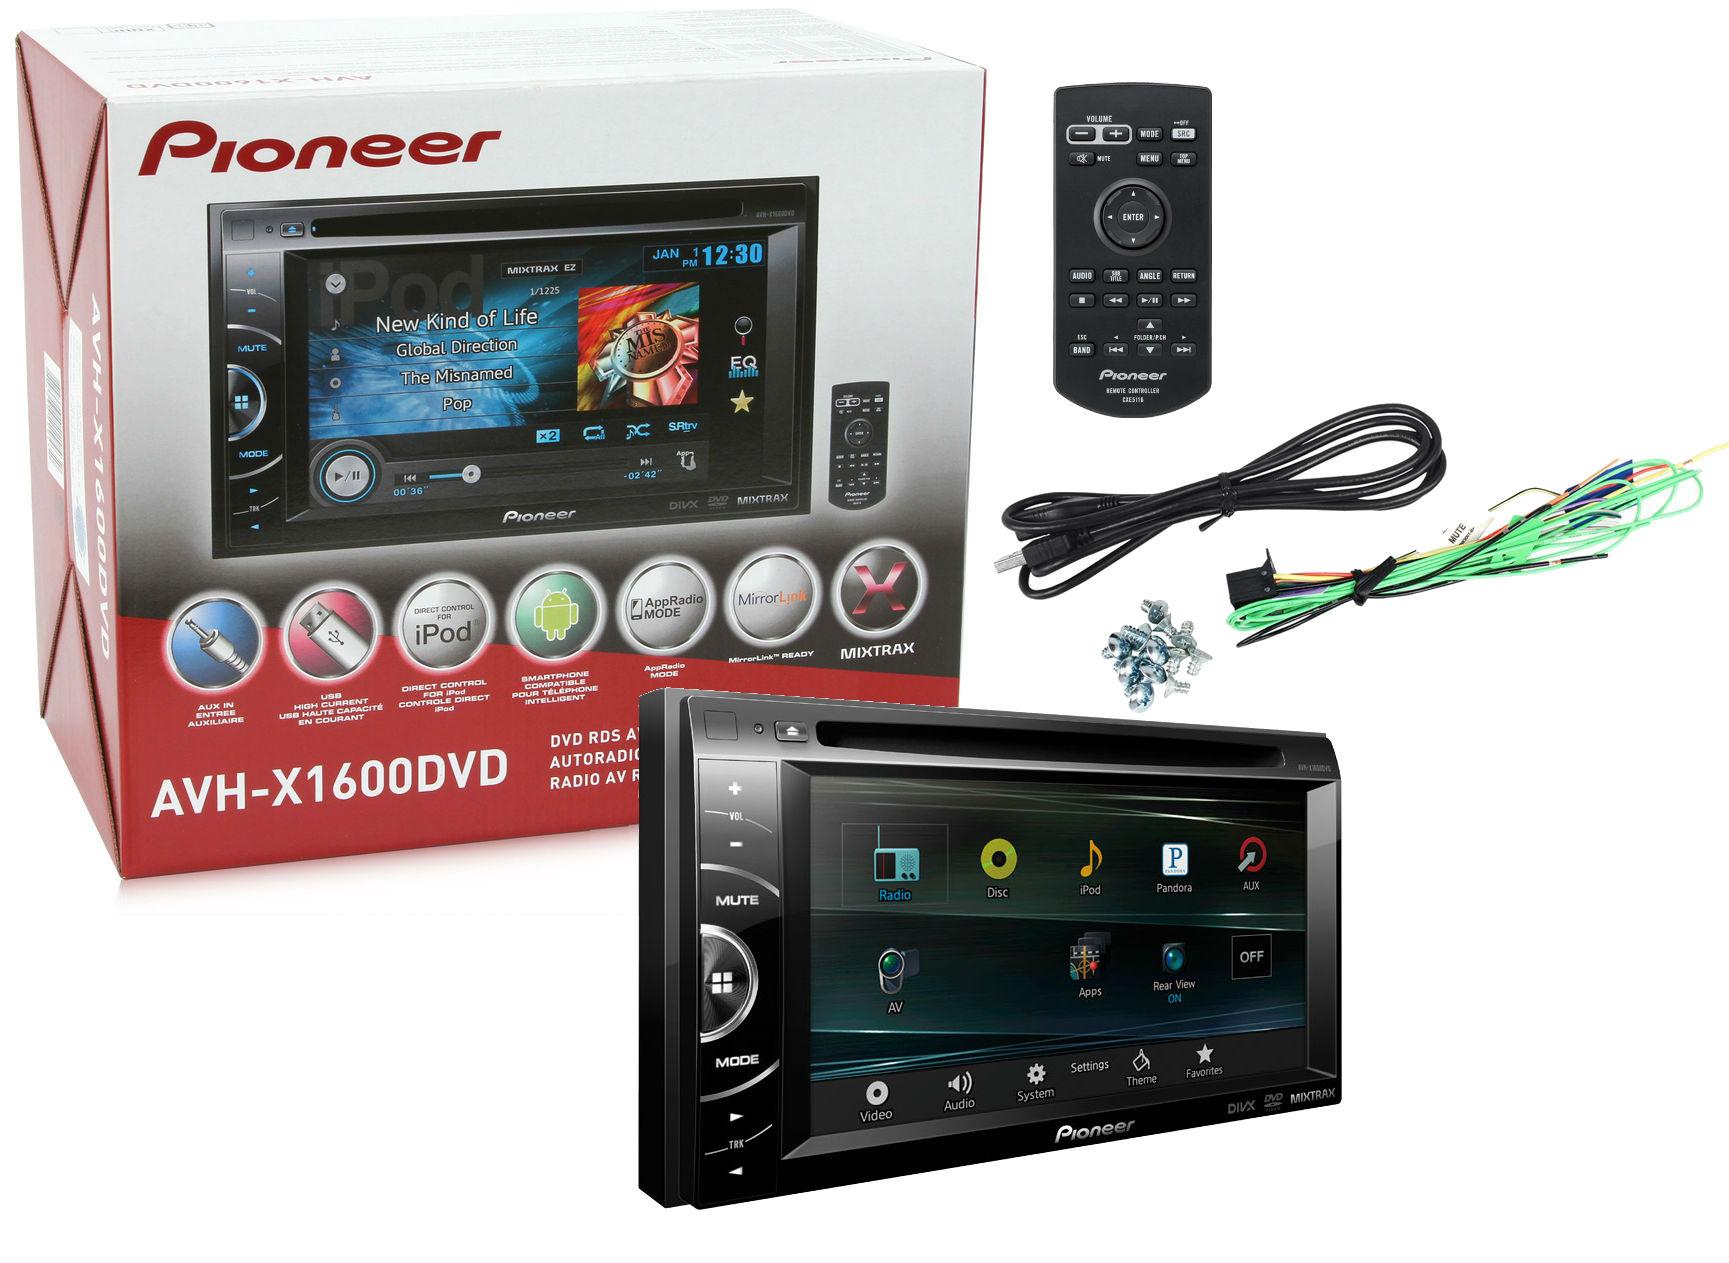 pioneer avh x1600dvd double din car 6 1 dvd mirrorlink. Black Bedroom Furniture Sets. Home Design Ideas